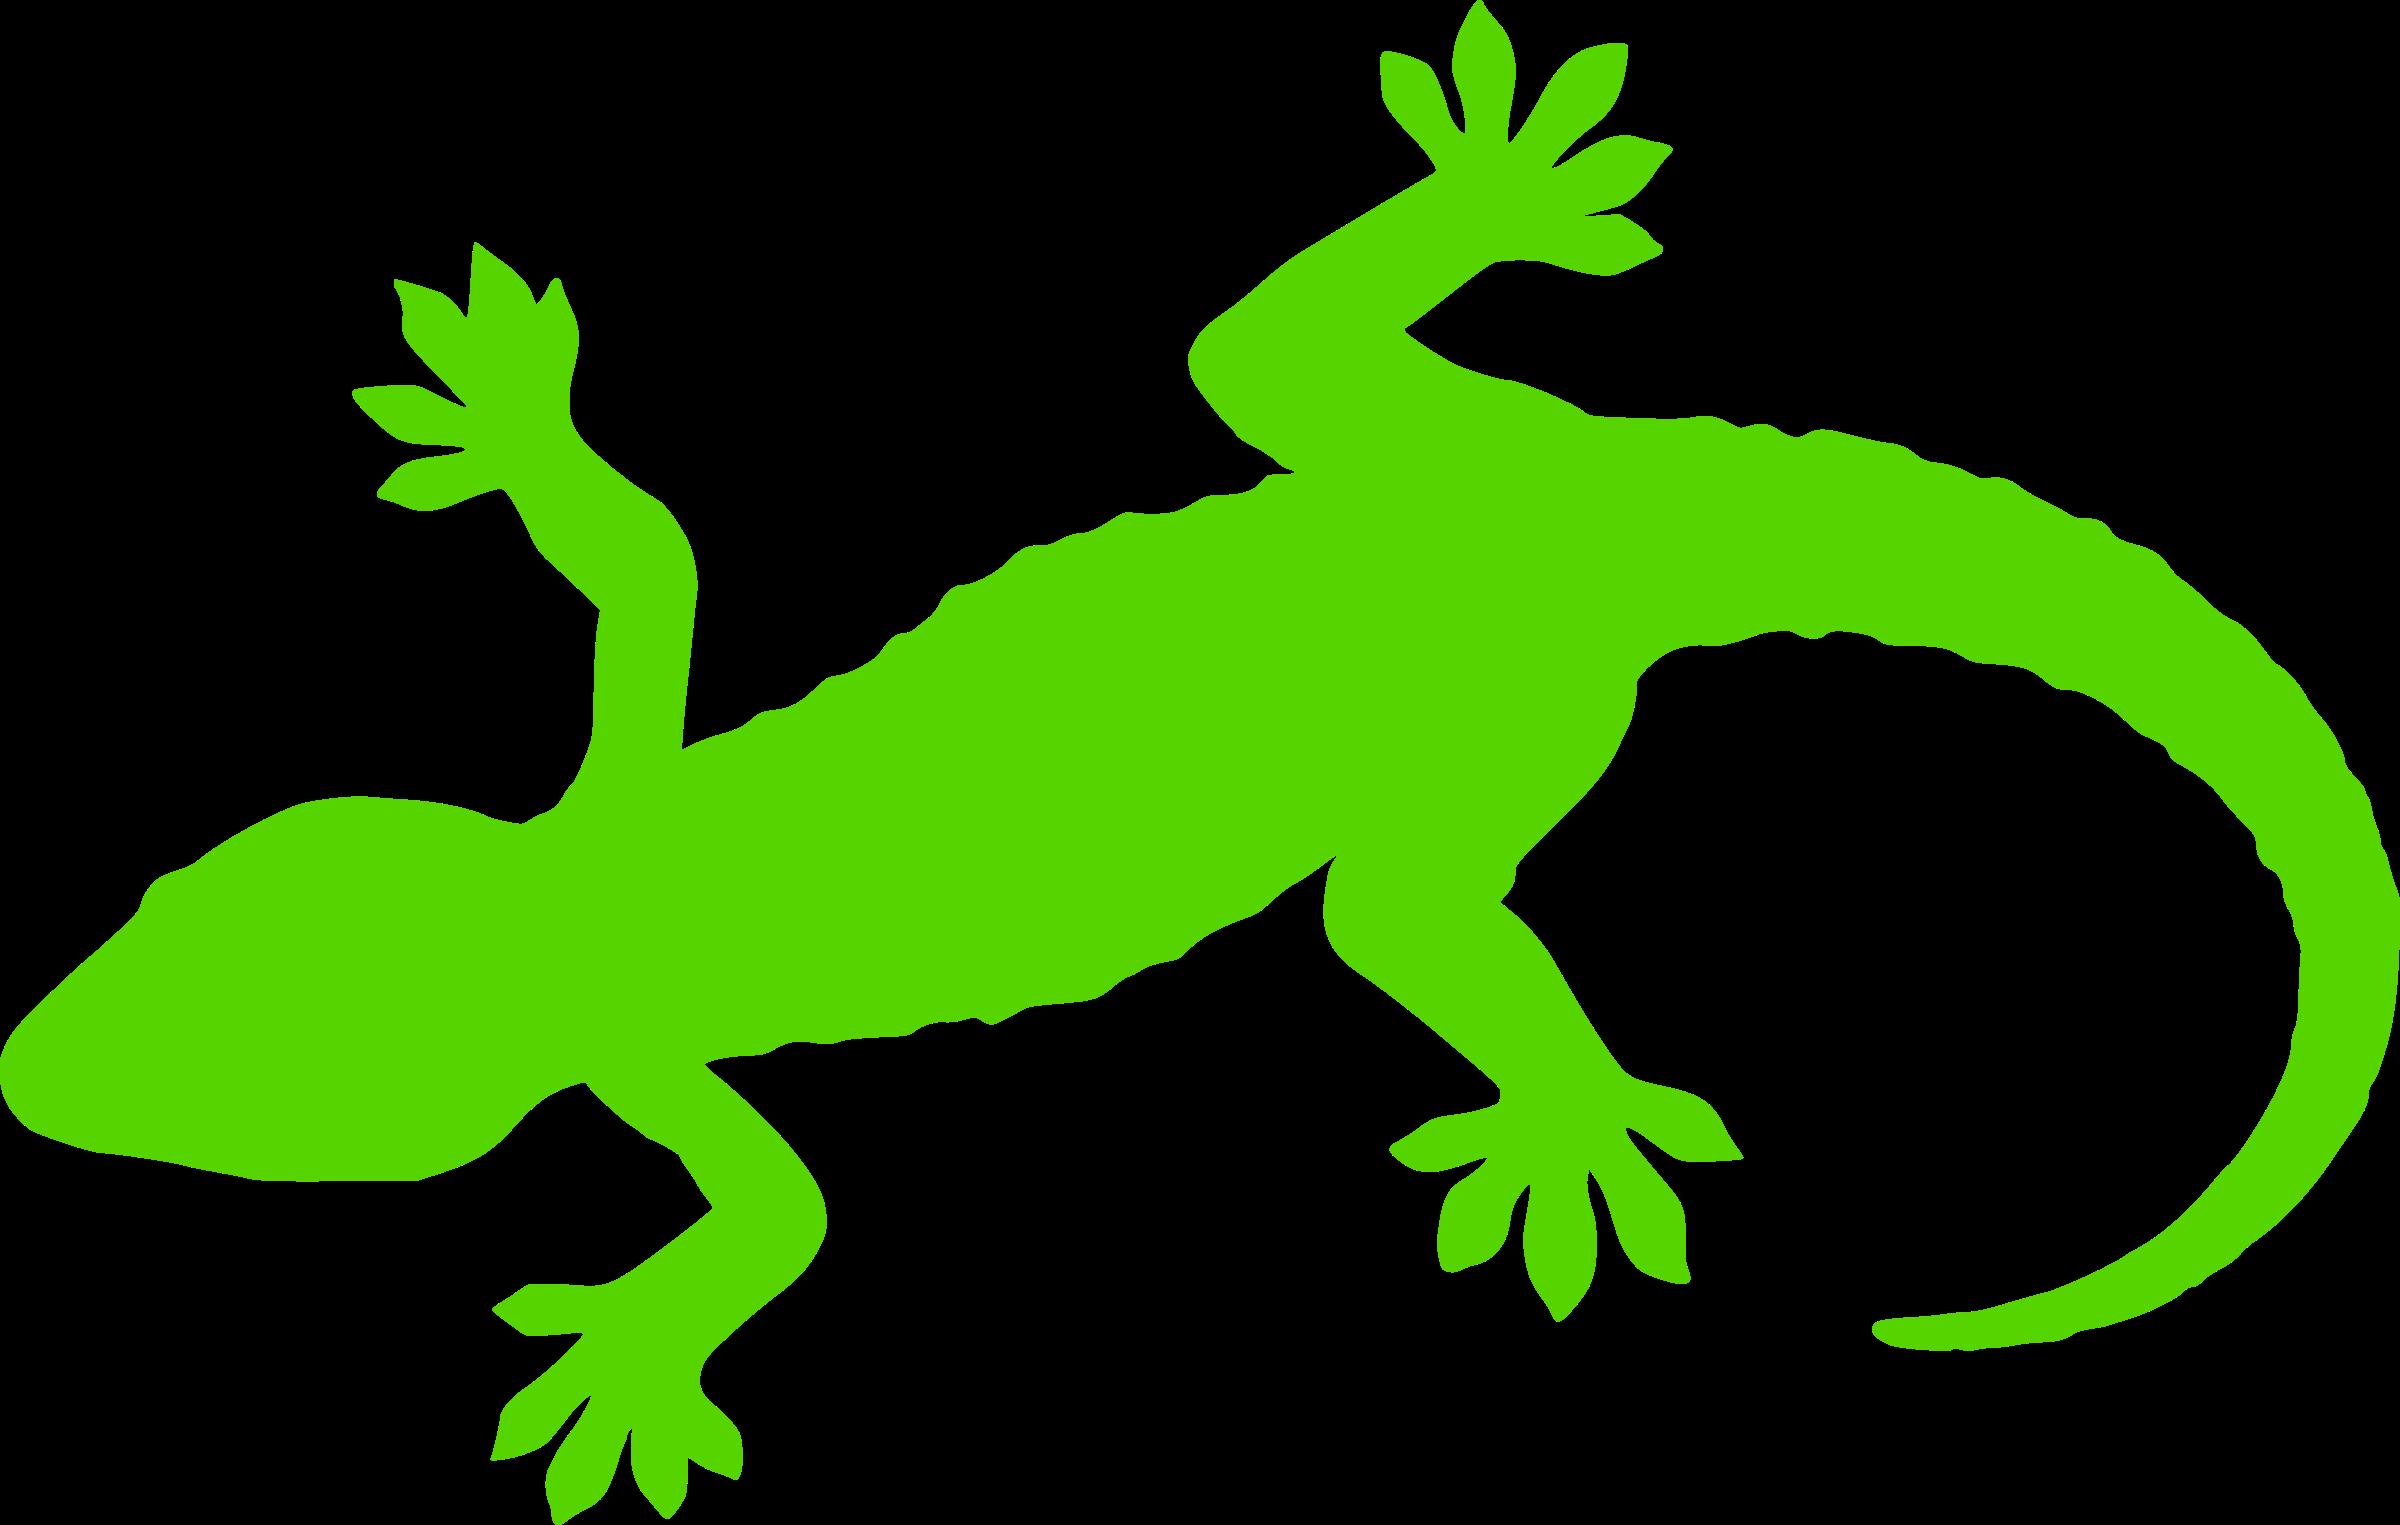 Footprint clipart gecko. Silhouette at getdrawings com